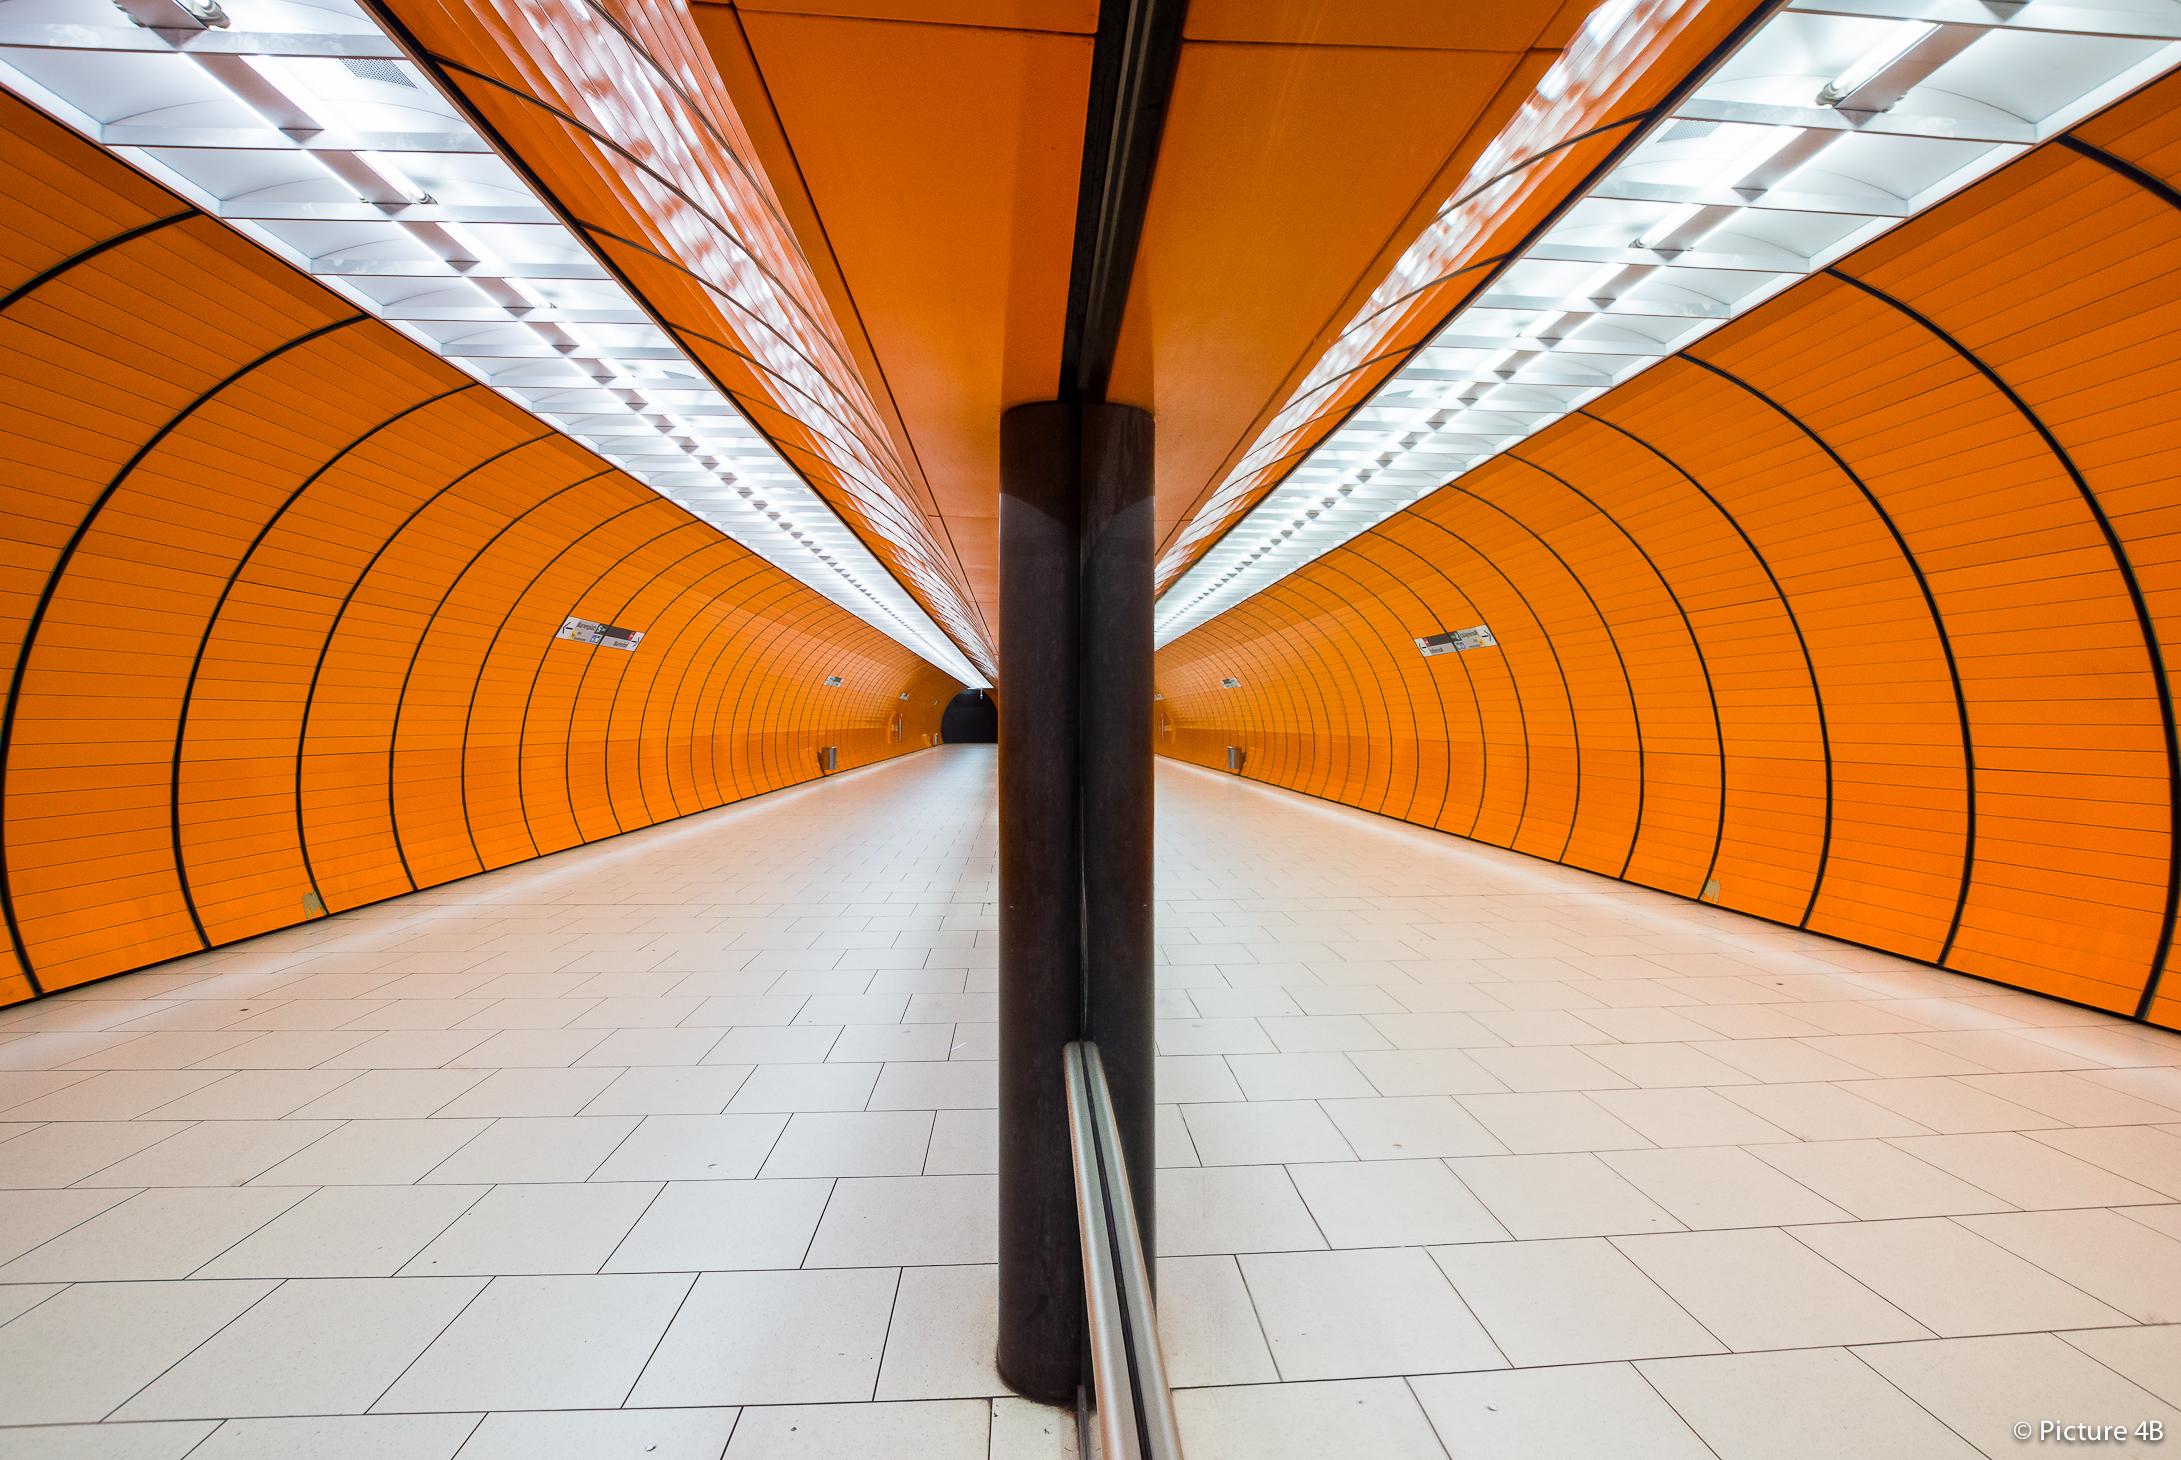 Badspiegel München wallpaper architecture reflection wood symmetry yellow